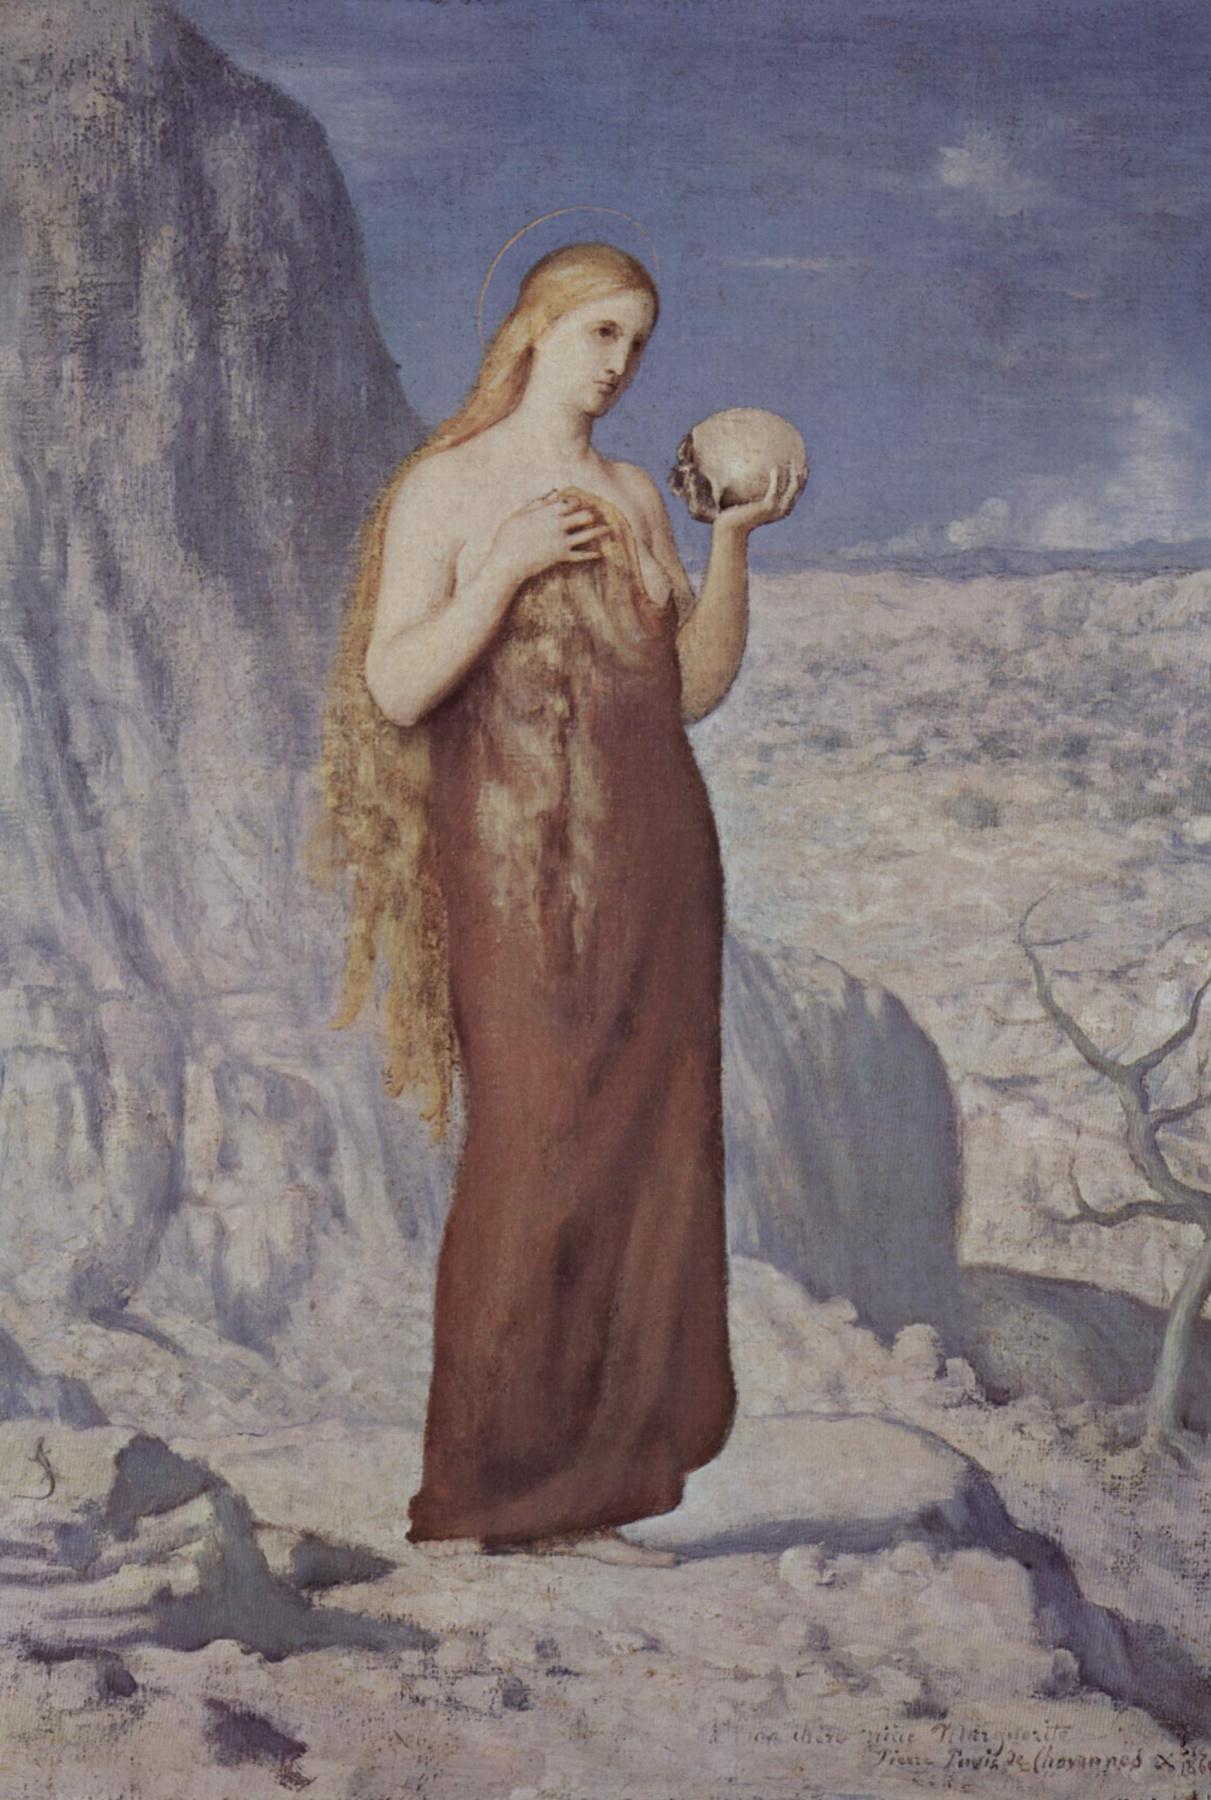 Pierre Cecil Puvi de Chavannes. Mary Magdalene in the desert